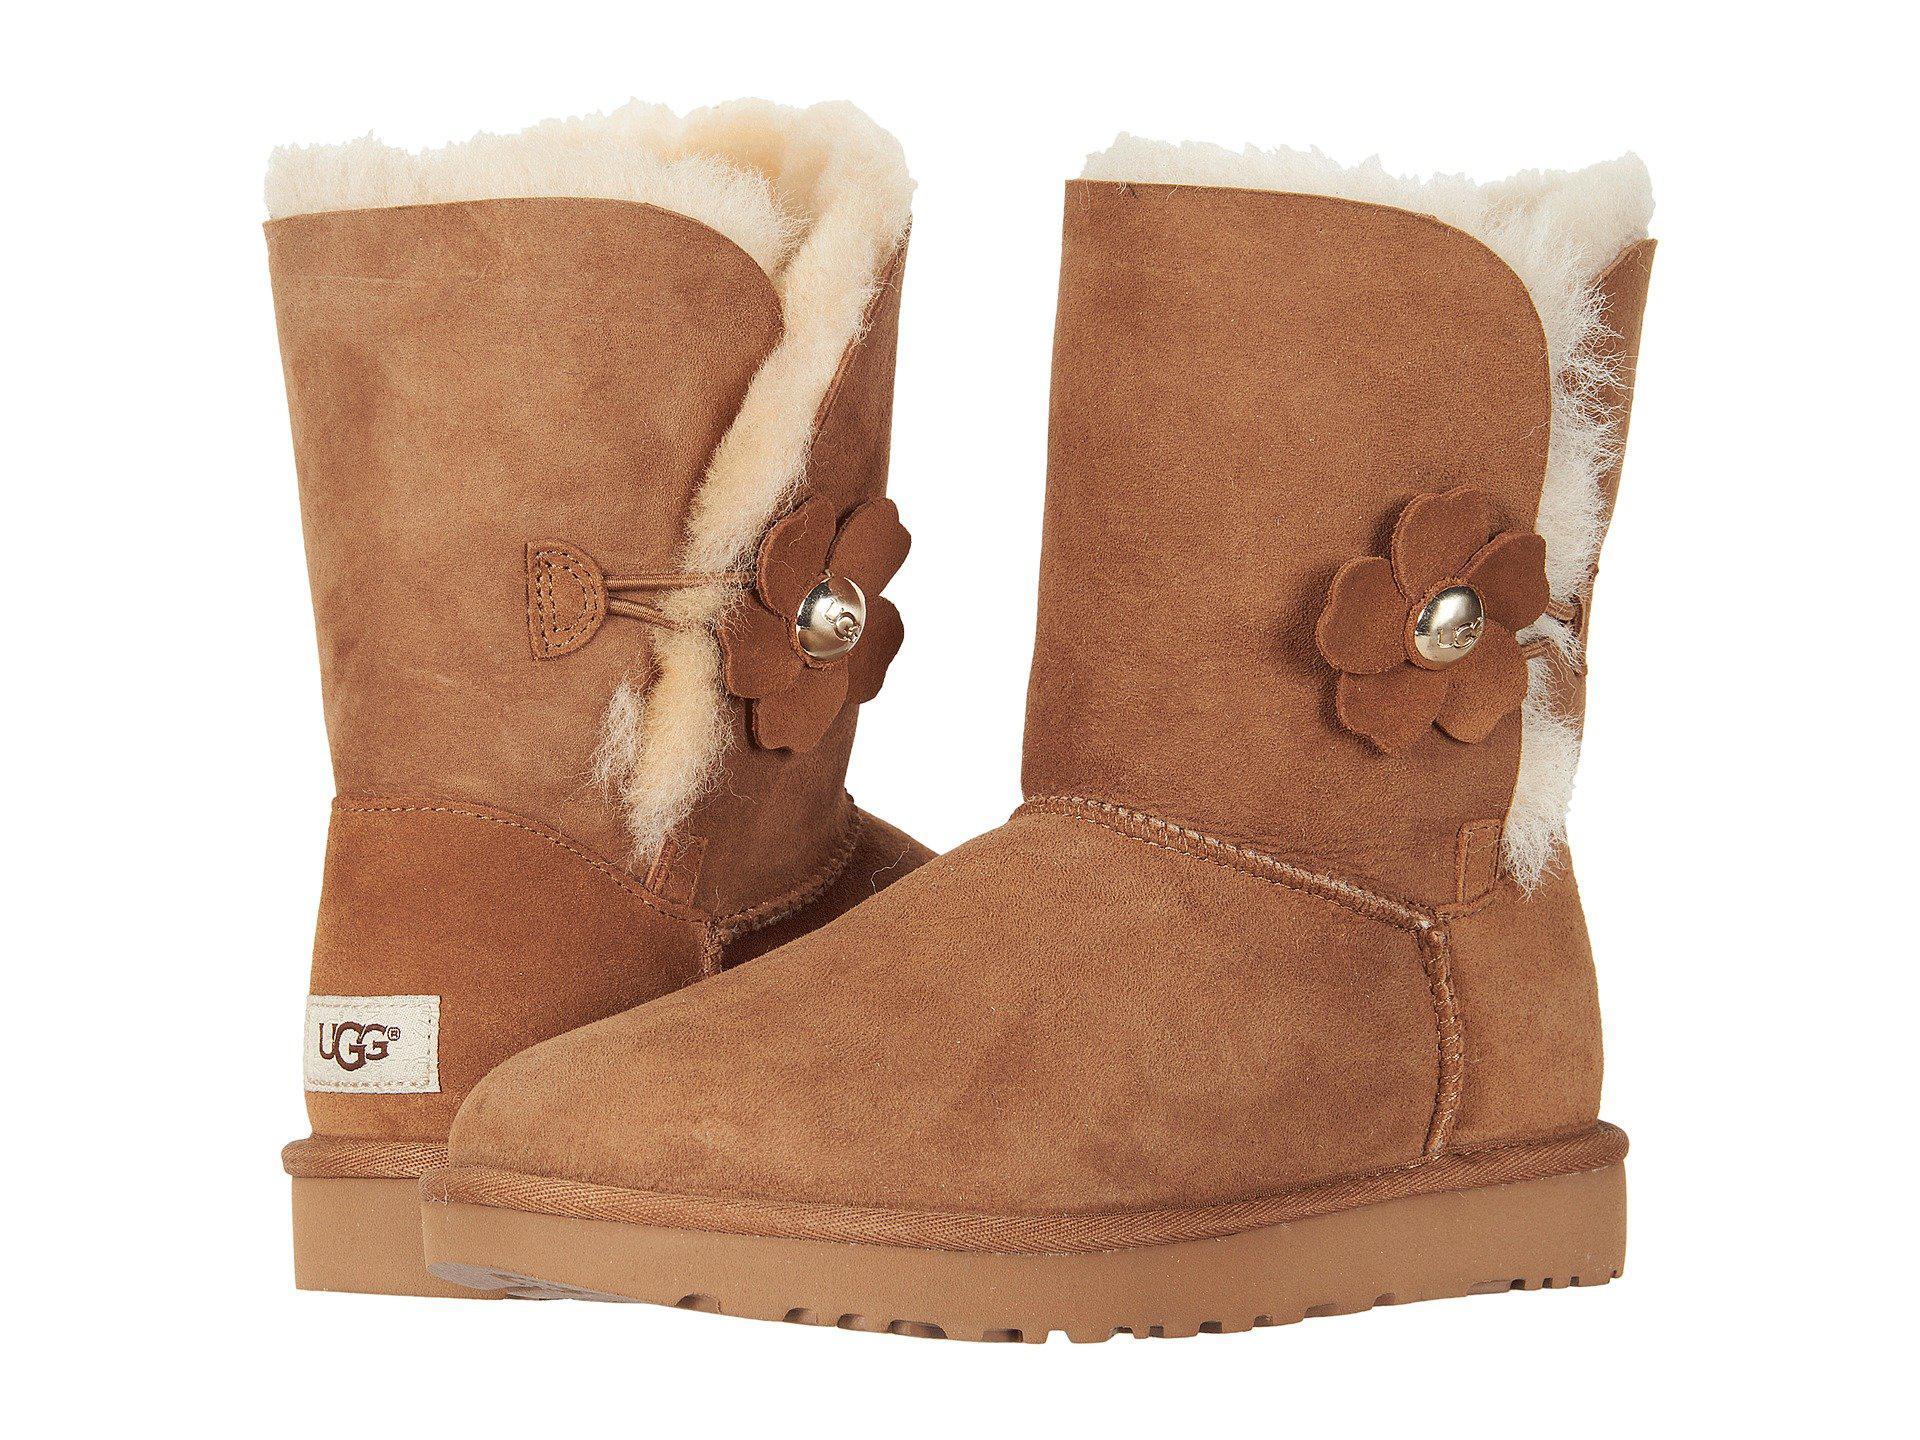 lyst ugg bailey button poppy chestnut women s pull on boots in brown rh lyst com